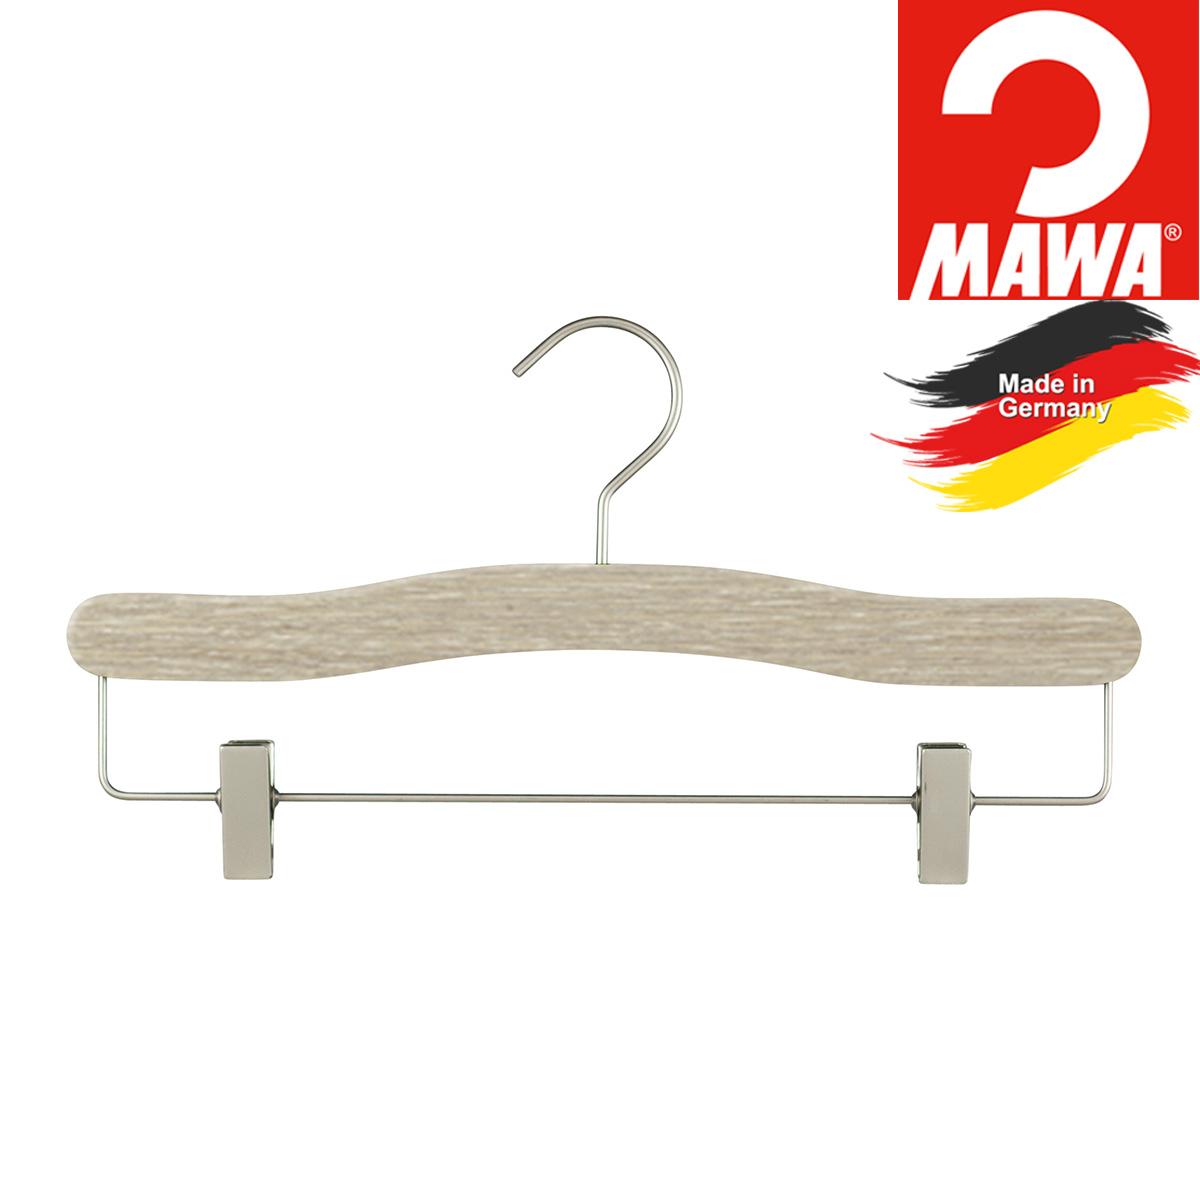 MAWA Hosen Kleiderbügel